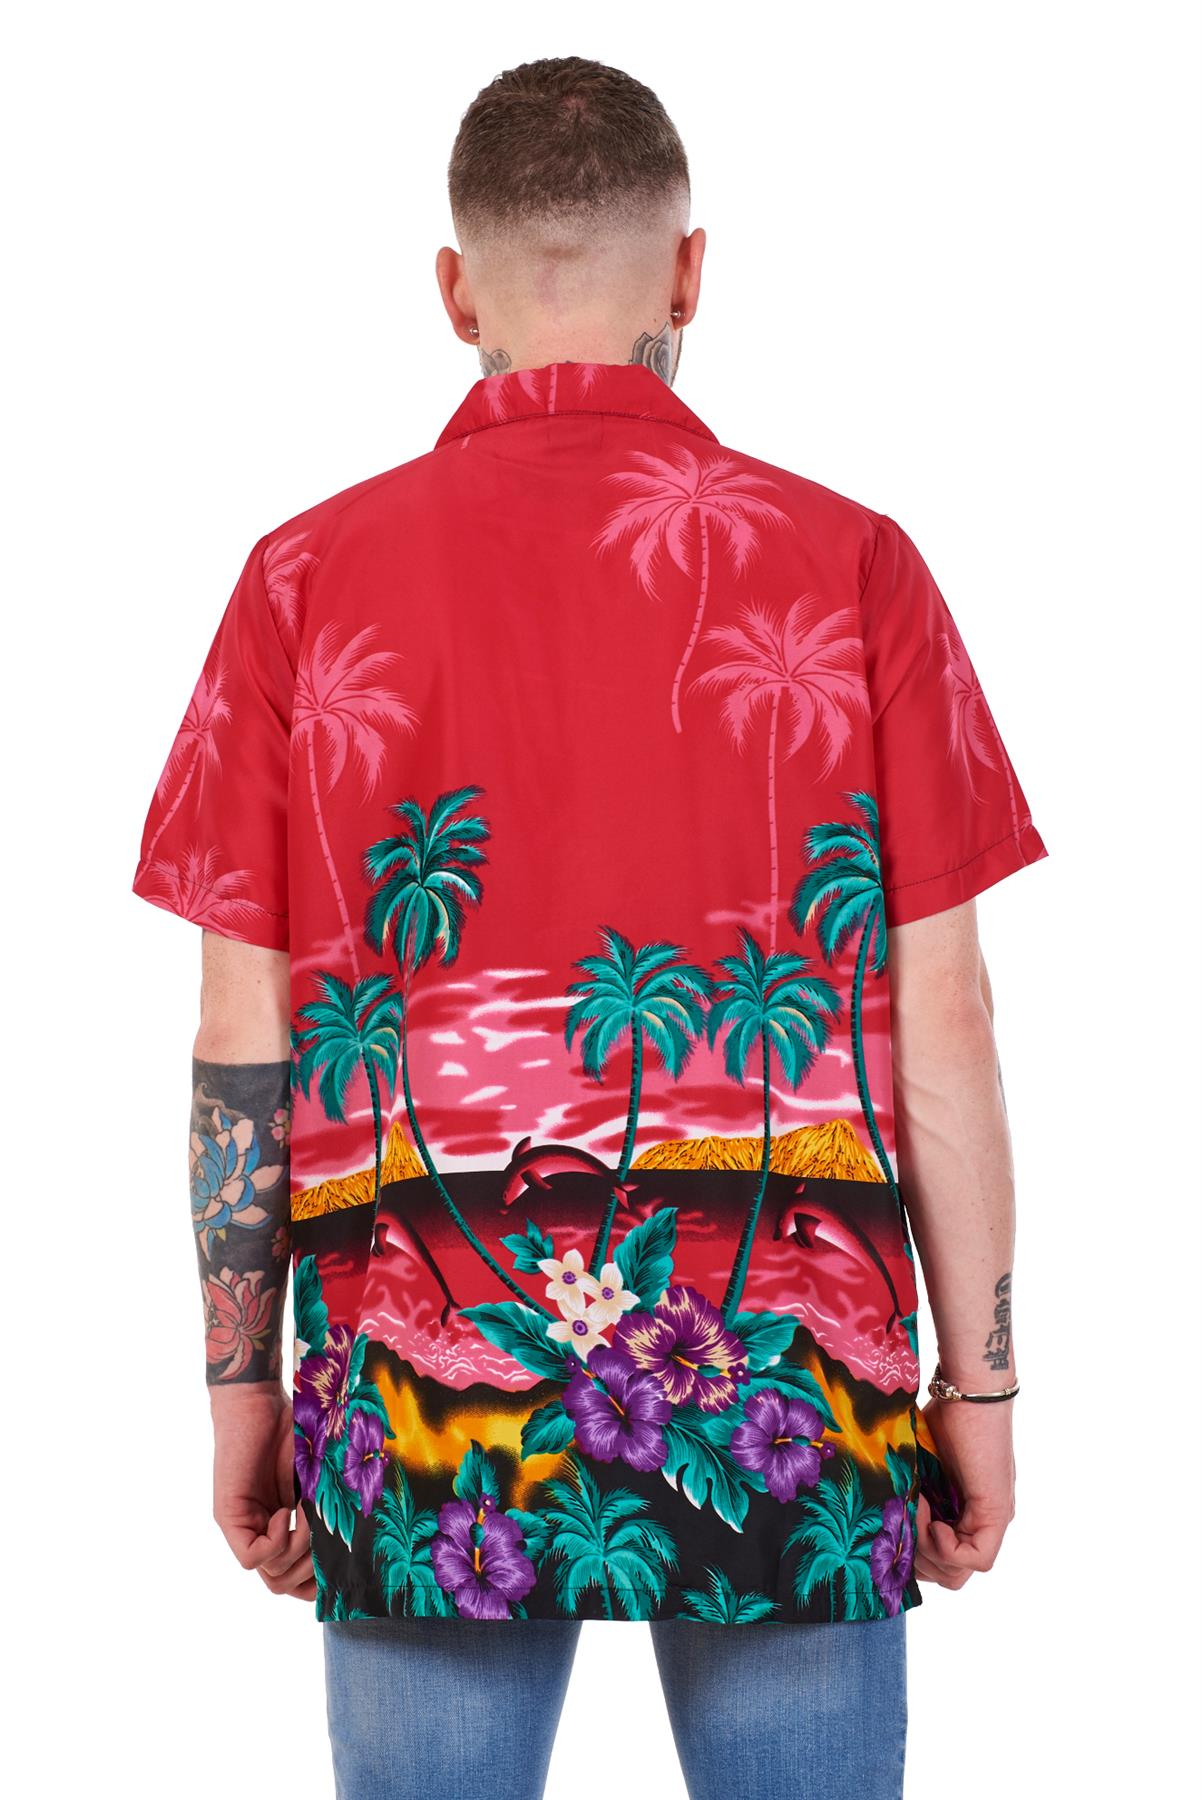 Mens-Hawaiian-Shirt-Multi-Colors-Print-Regular-Big-Size-Summer-Fancy-Dress-M-5XL thumbnail 15